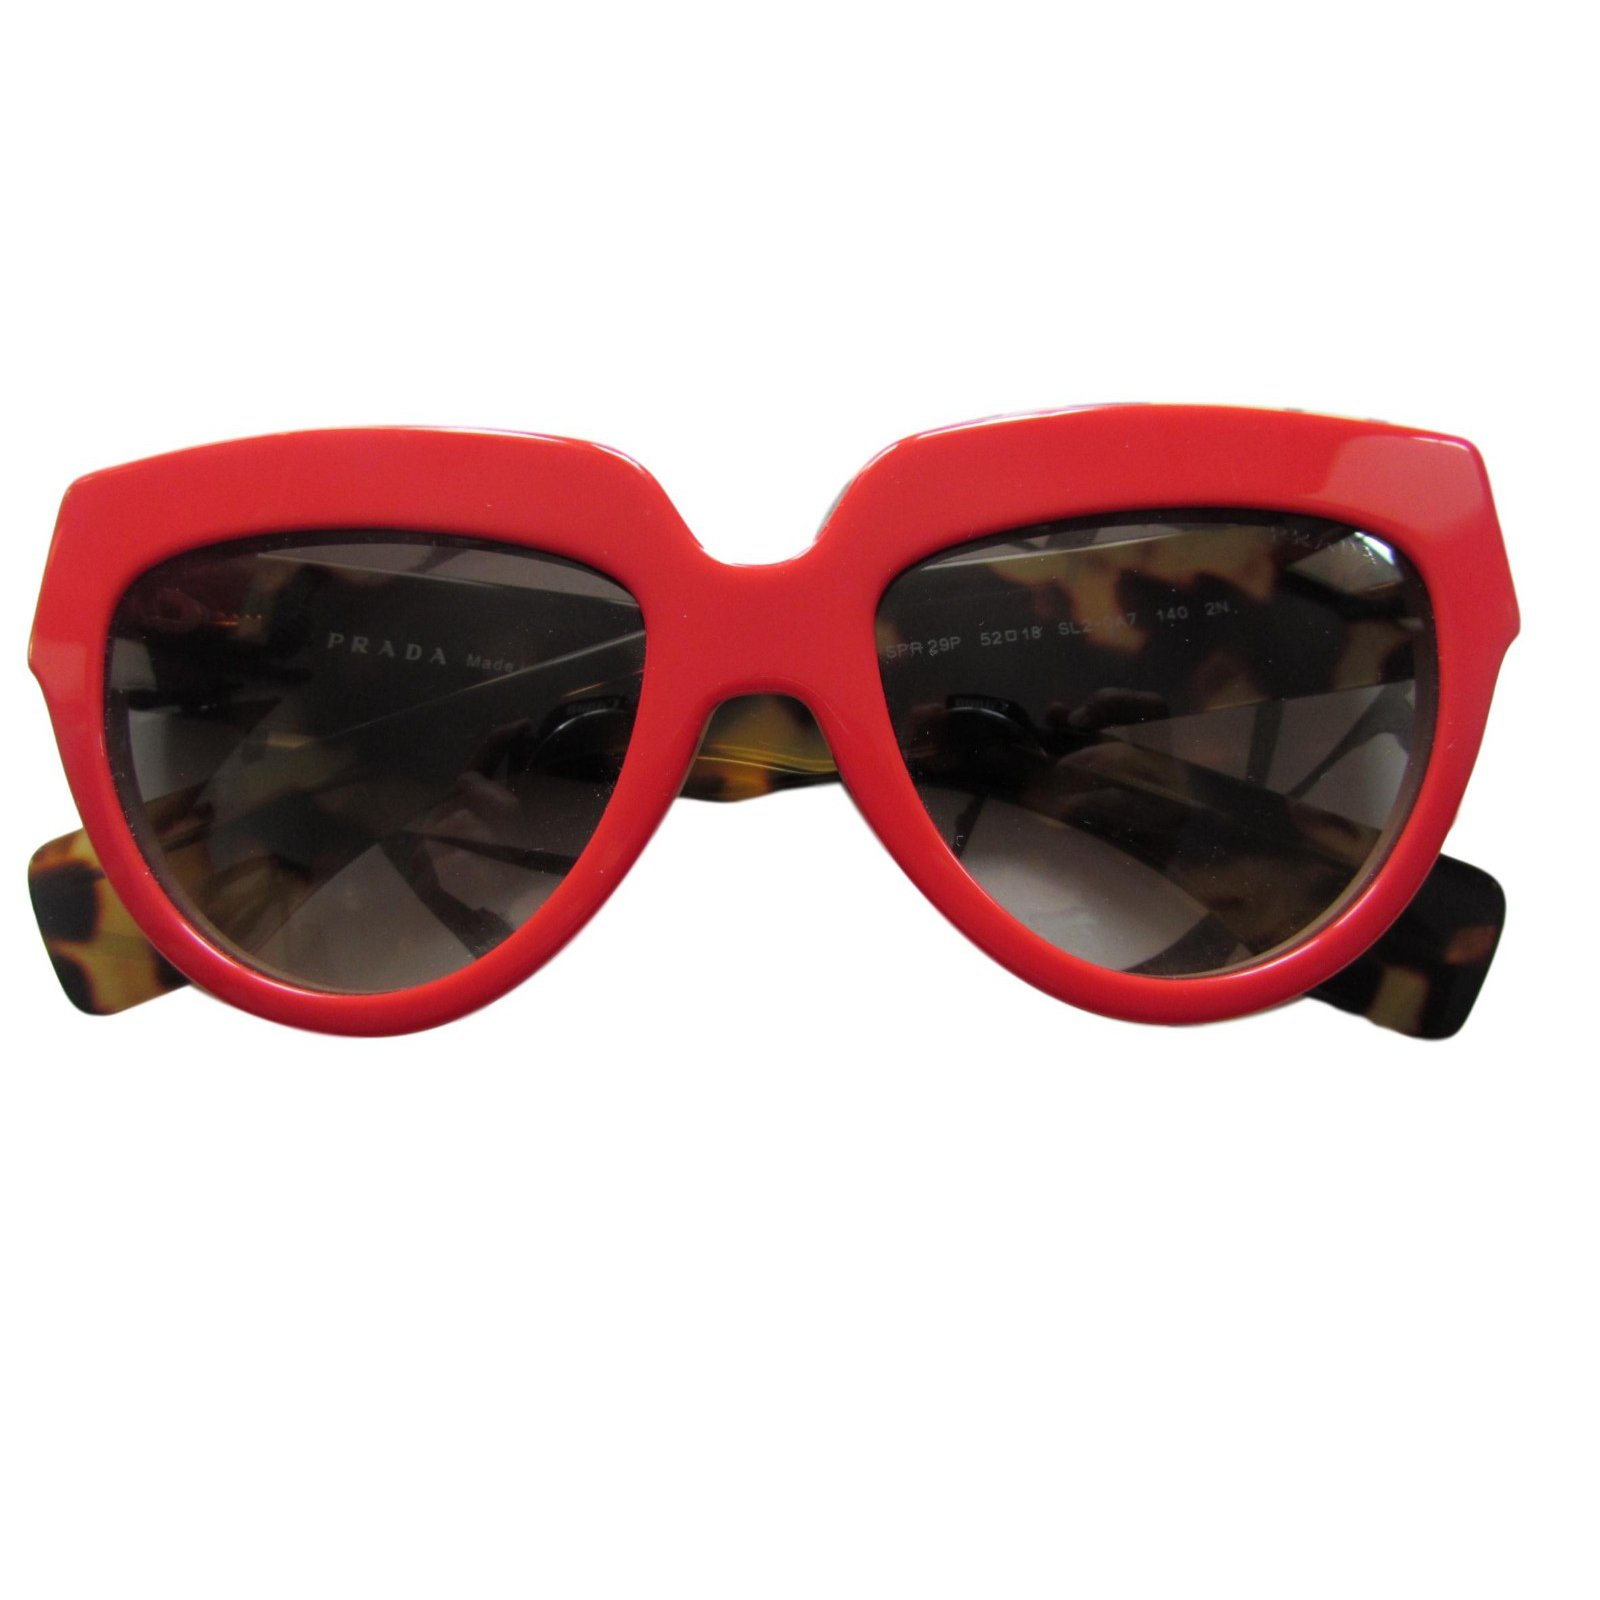 295086376526 ... canada prada sunglasses sunglasses acetate brownred ref.78239 73be7  37532